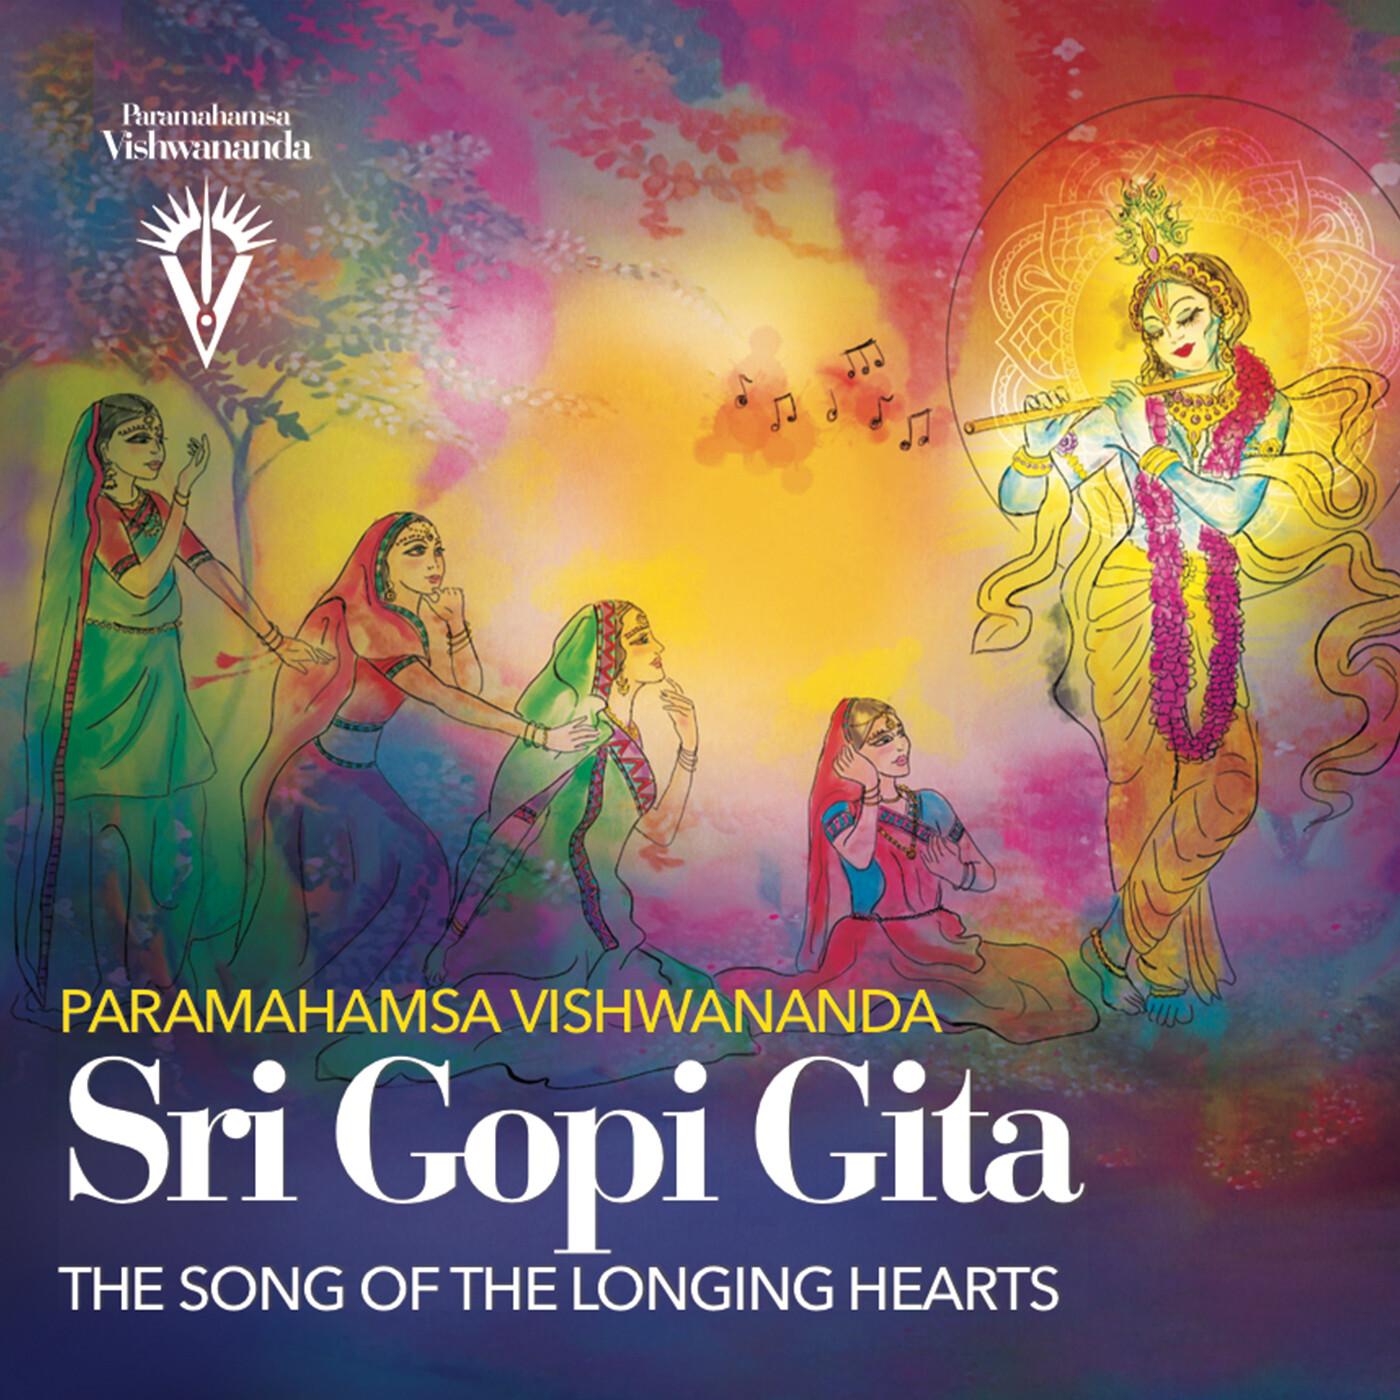 Sri Gopi Gita, The Song of the Longing Hearts - Paramahamsa Vishwananda